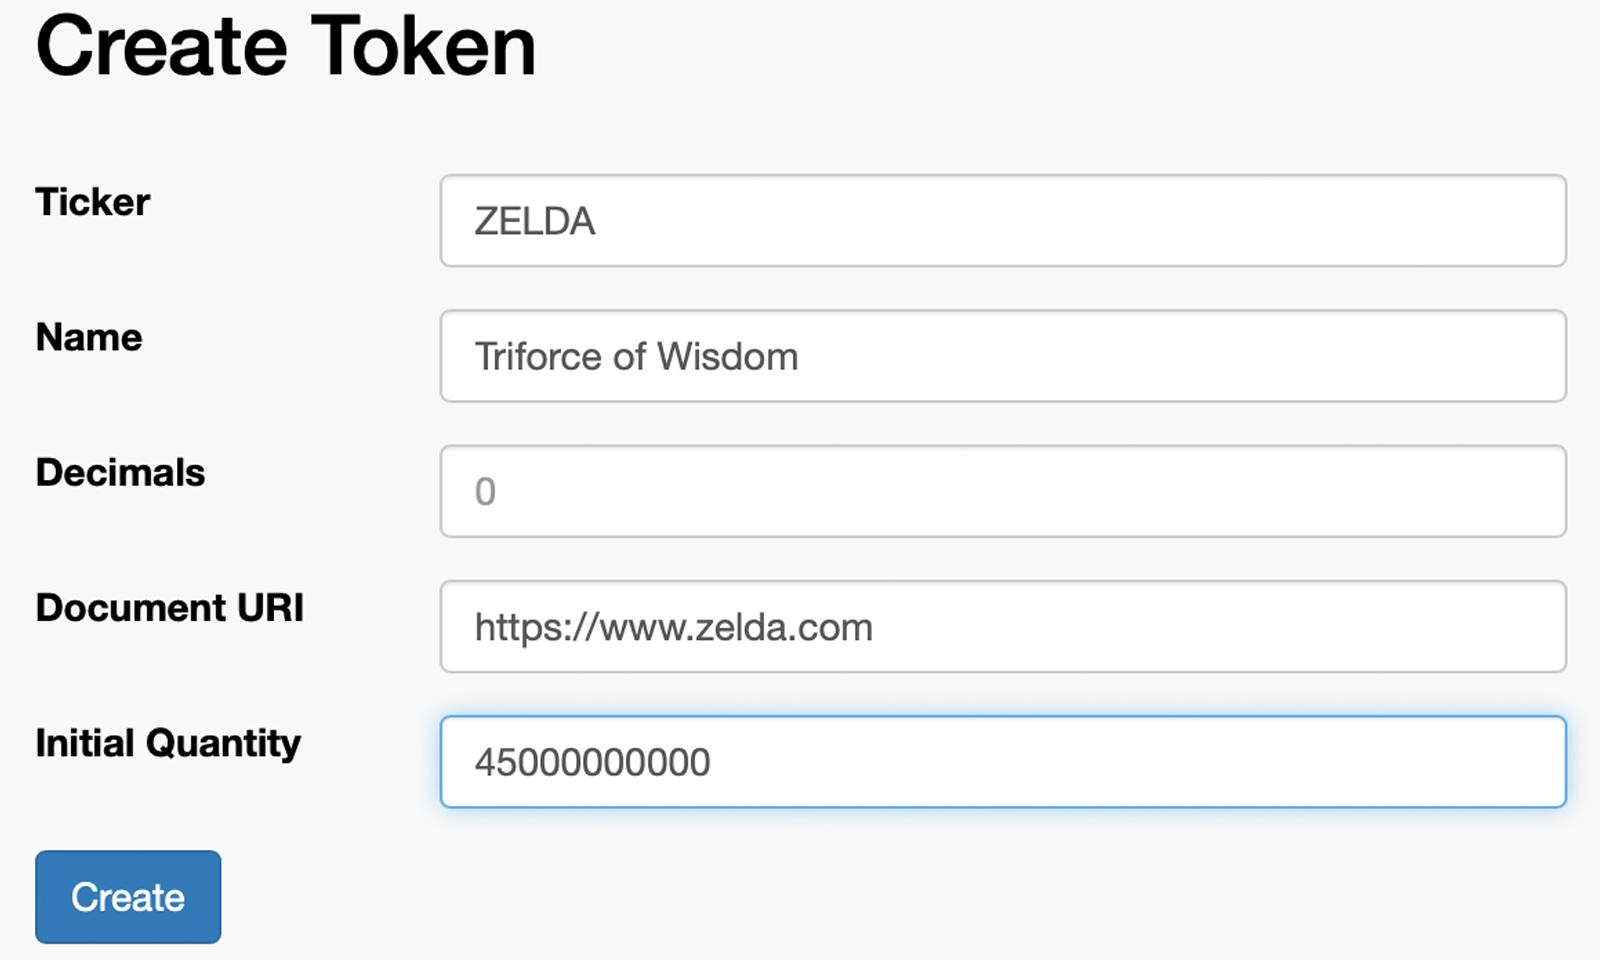 Creating Your Own SLP-Based Token Using Memo